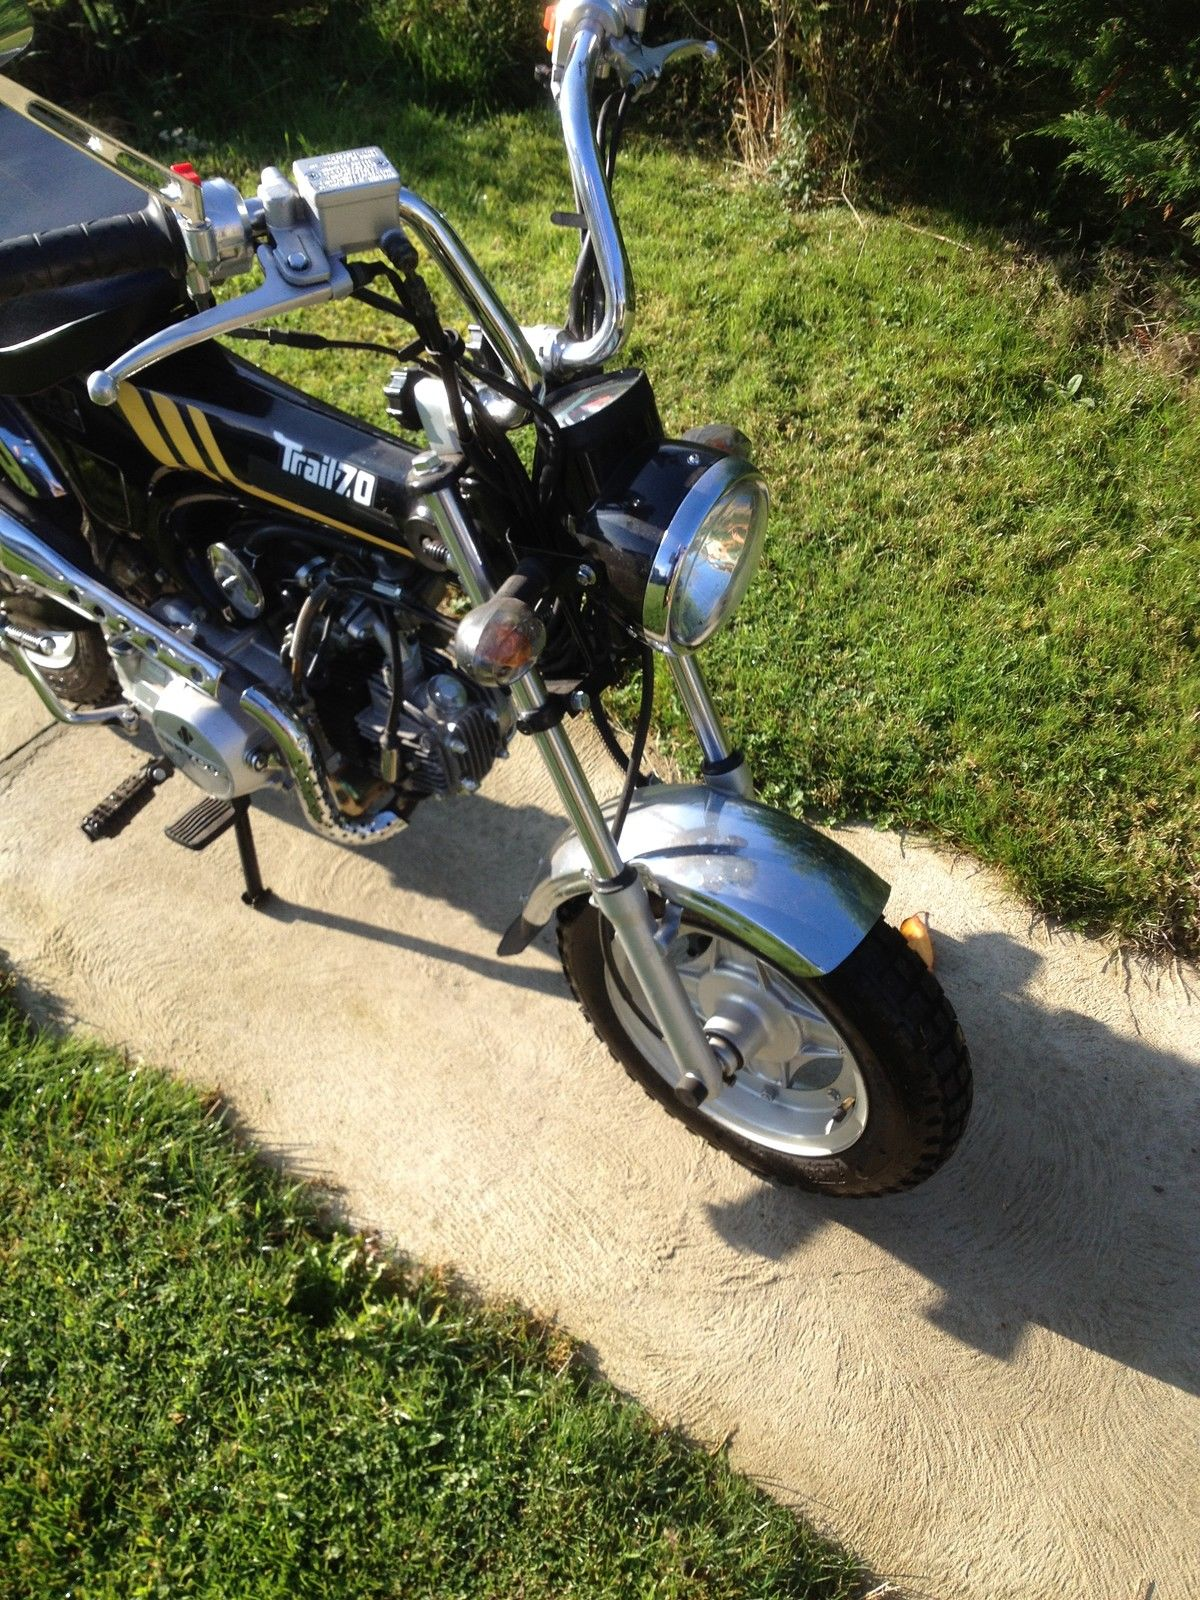 Skygo lifan monkey bike 110cc